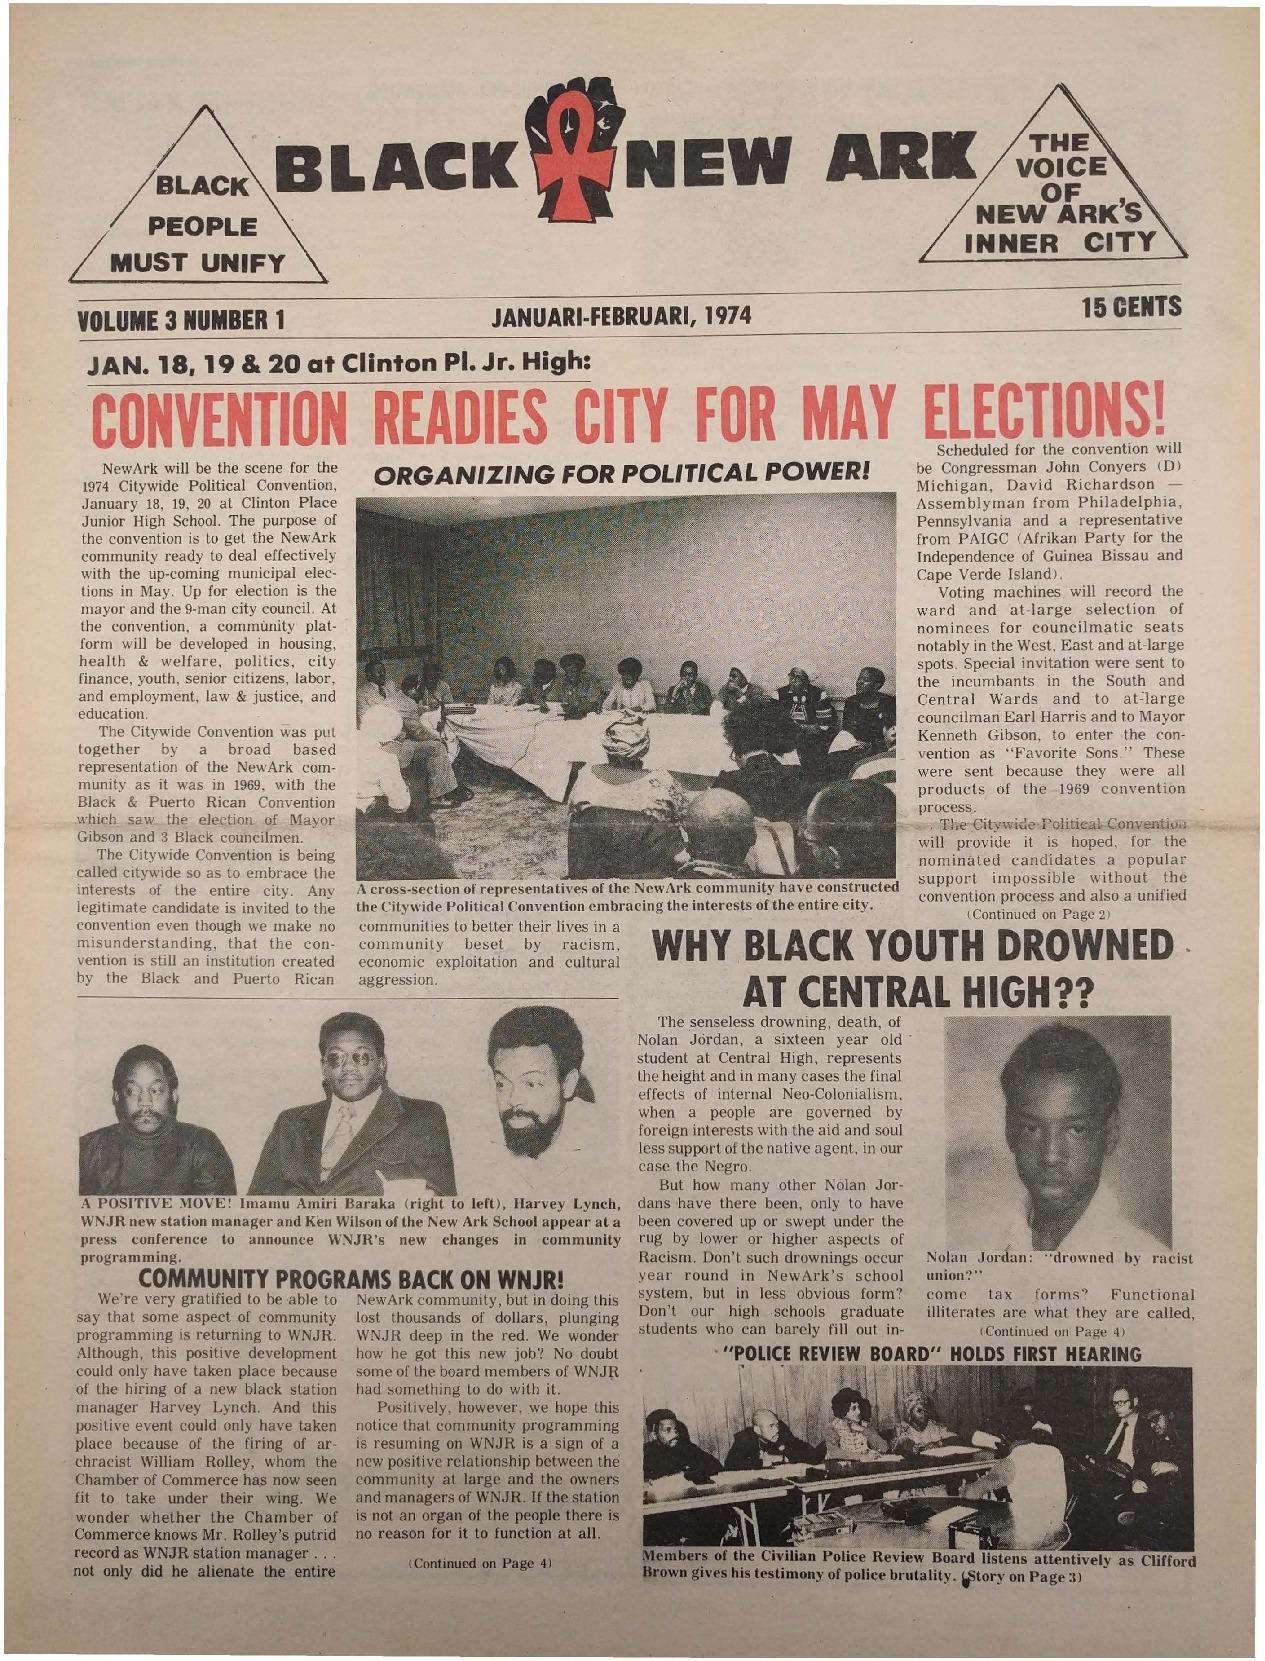 Black NewArk (Jan-Feb 1974)